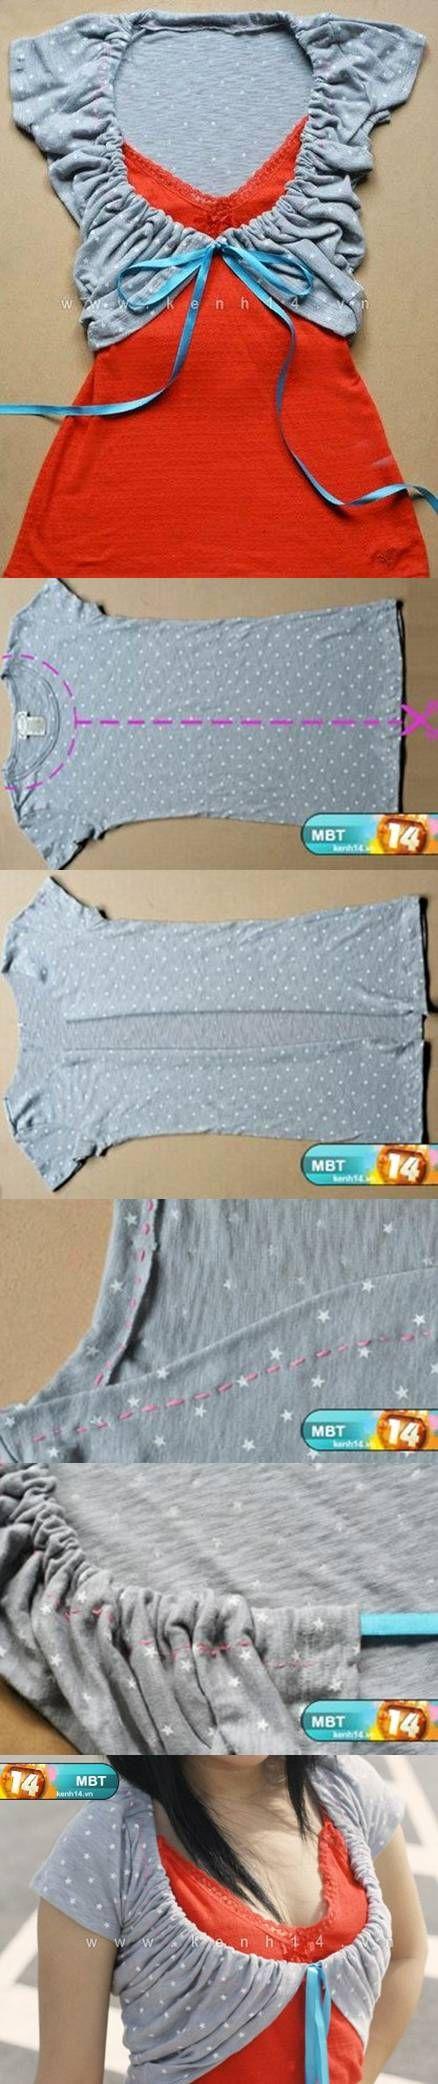 DIY Shirt Decor DIY Shirt Decor